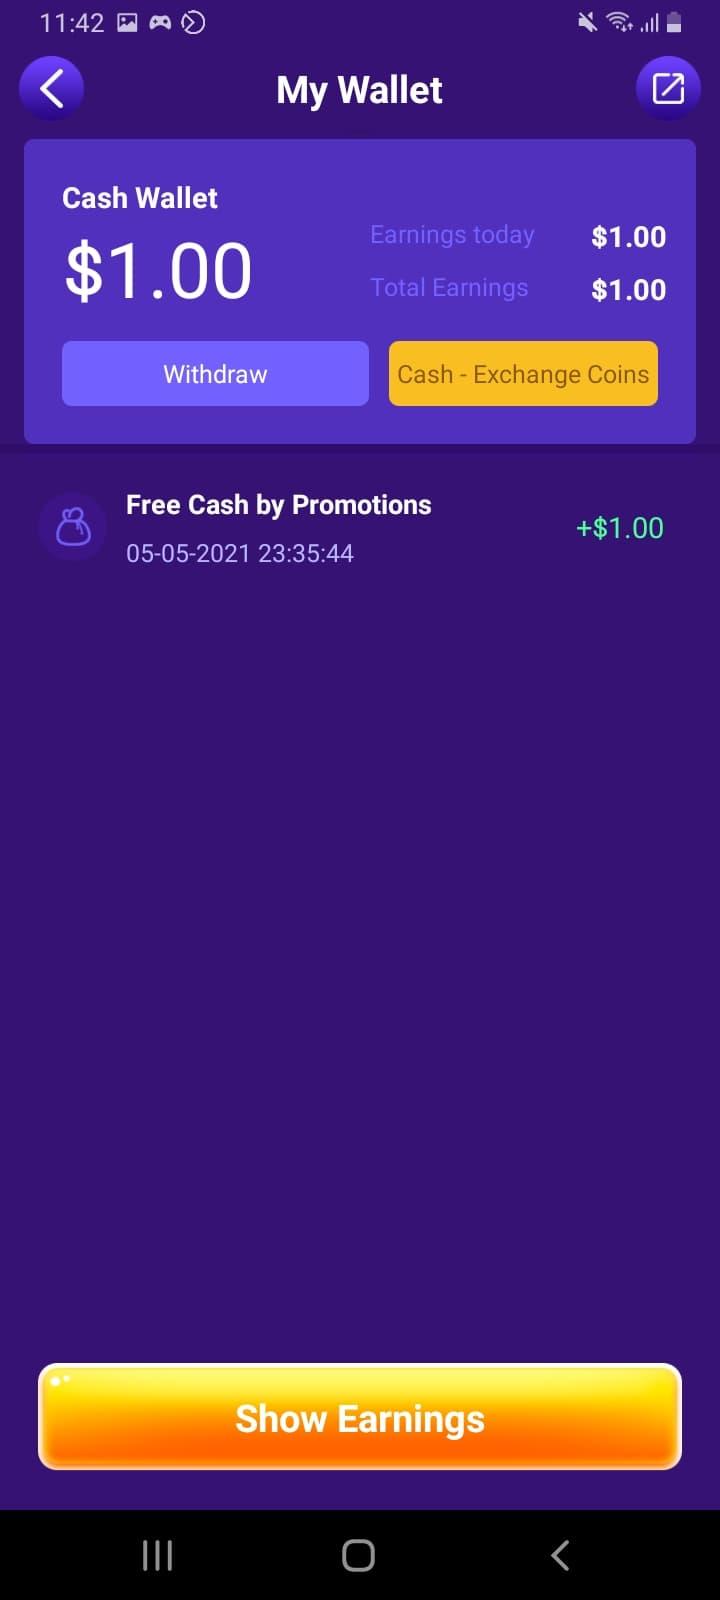 GoGoal App Review - Legit or Scam? $10 in Paypal 1